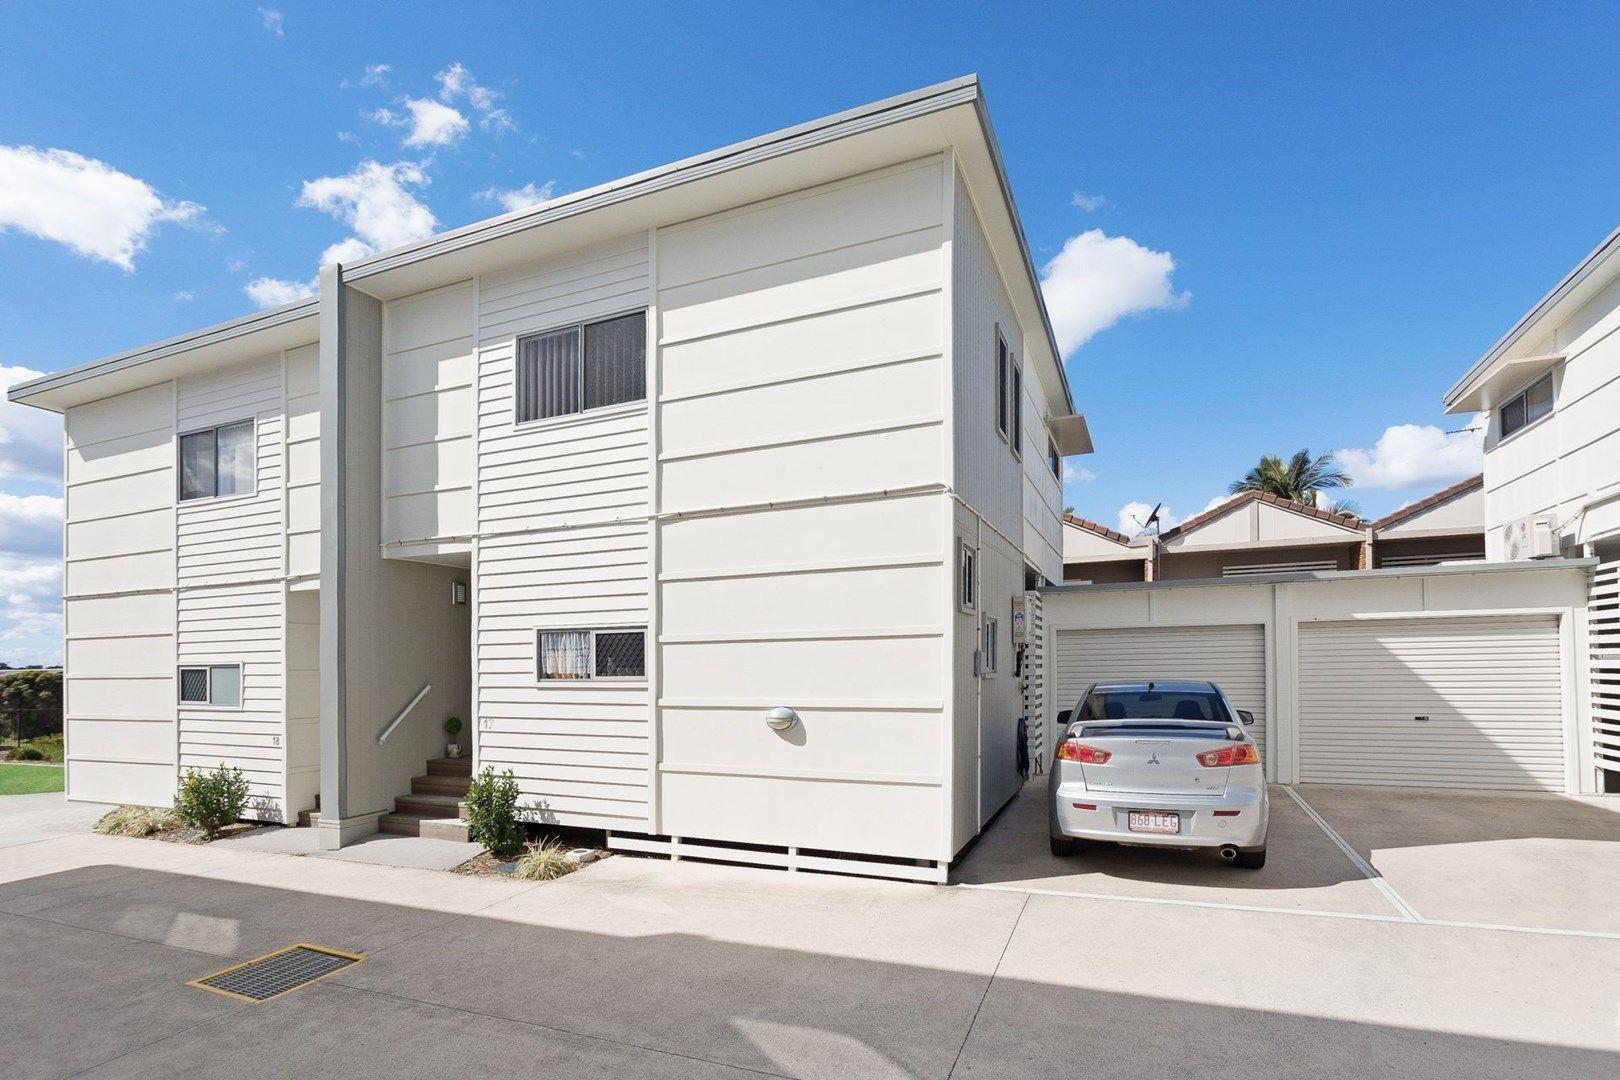 17/6 Lillian st, Redbank Plains QLD 4301, Image 0